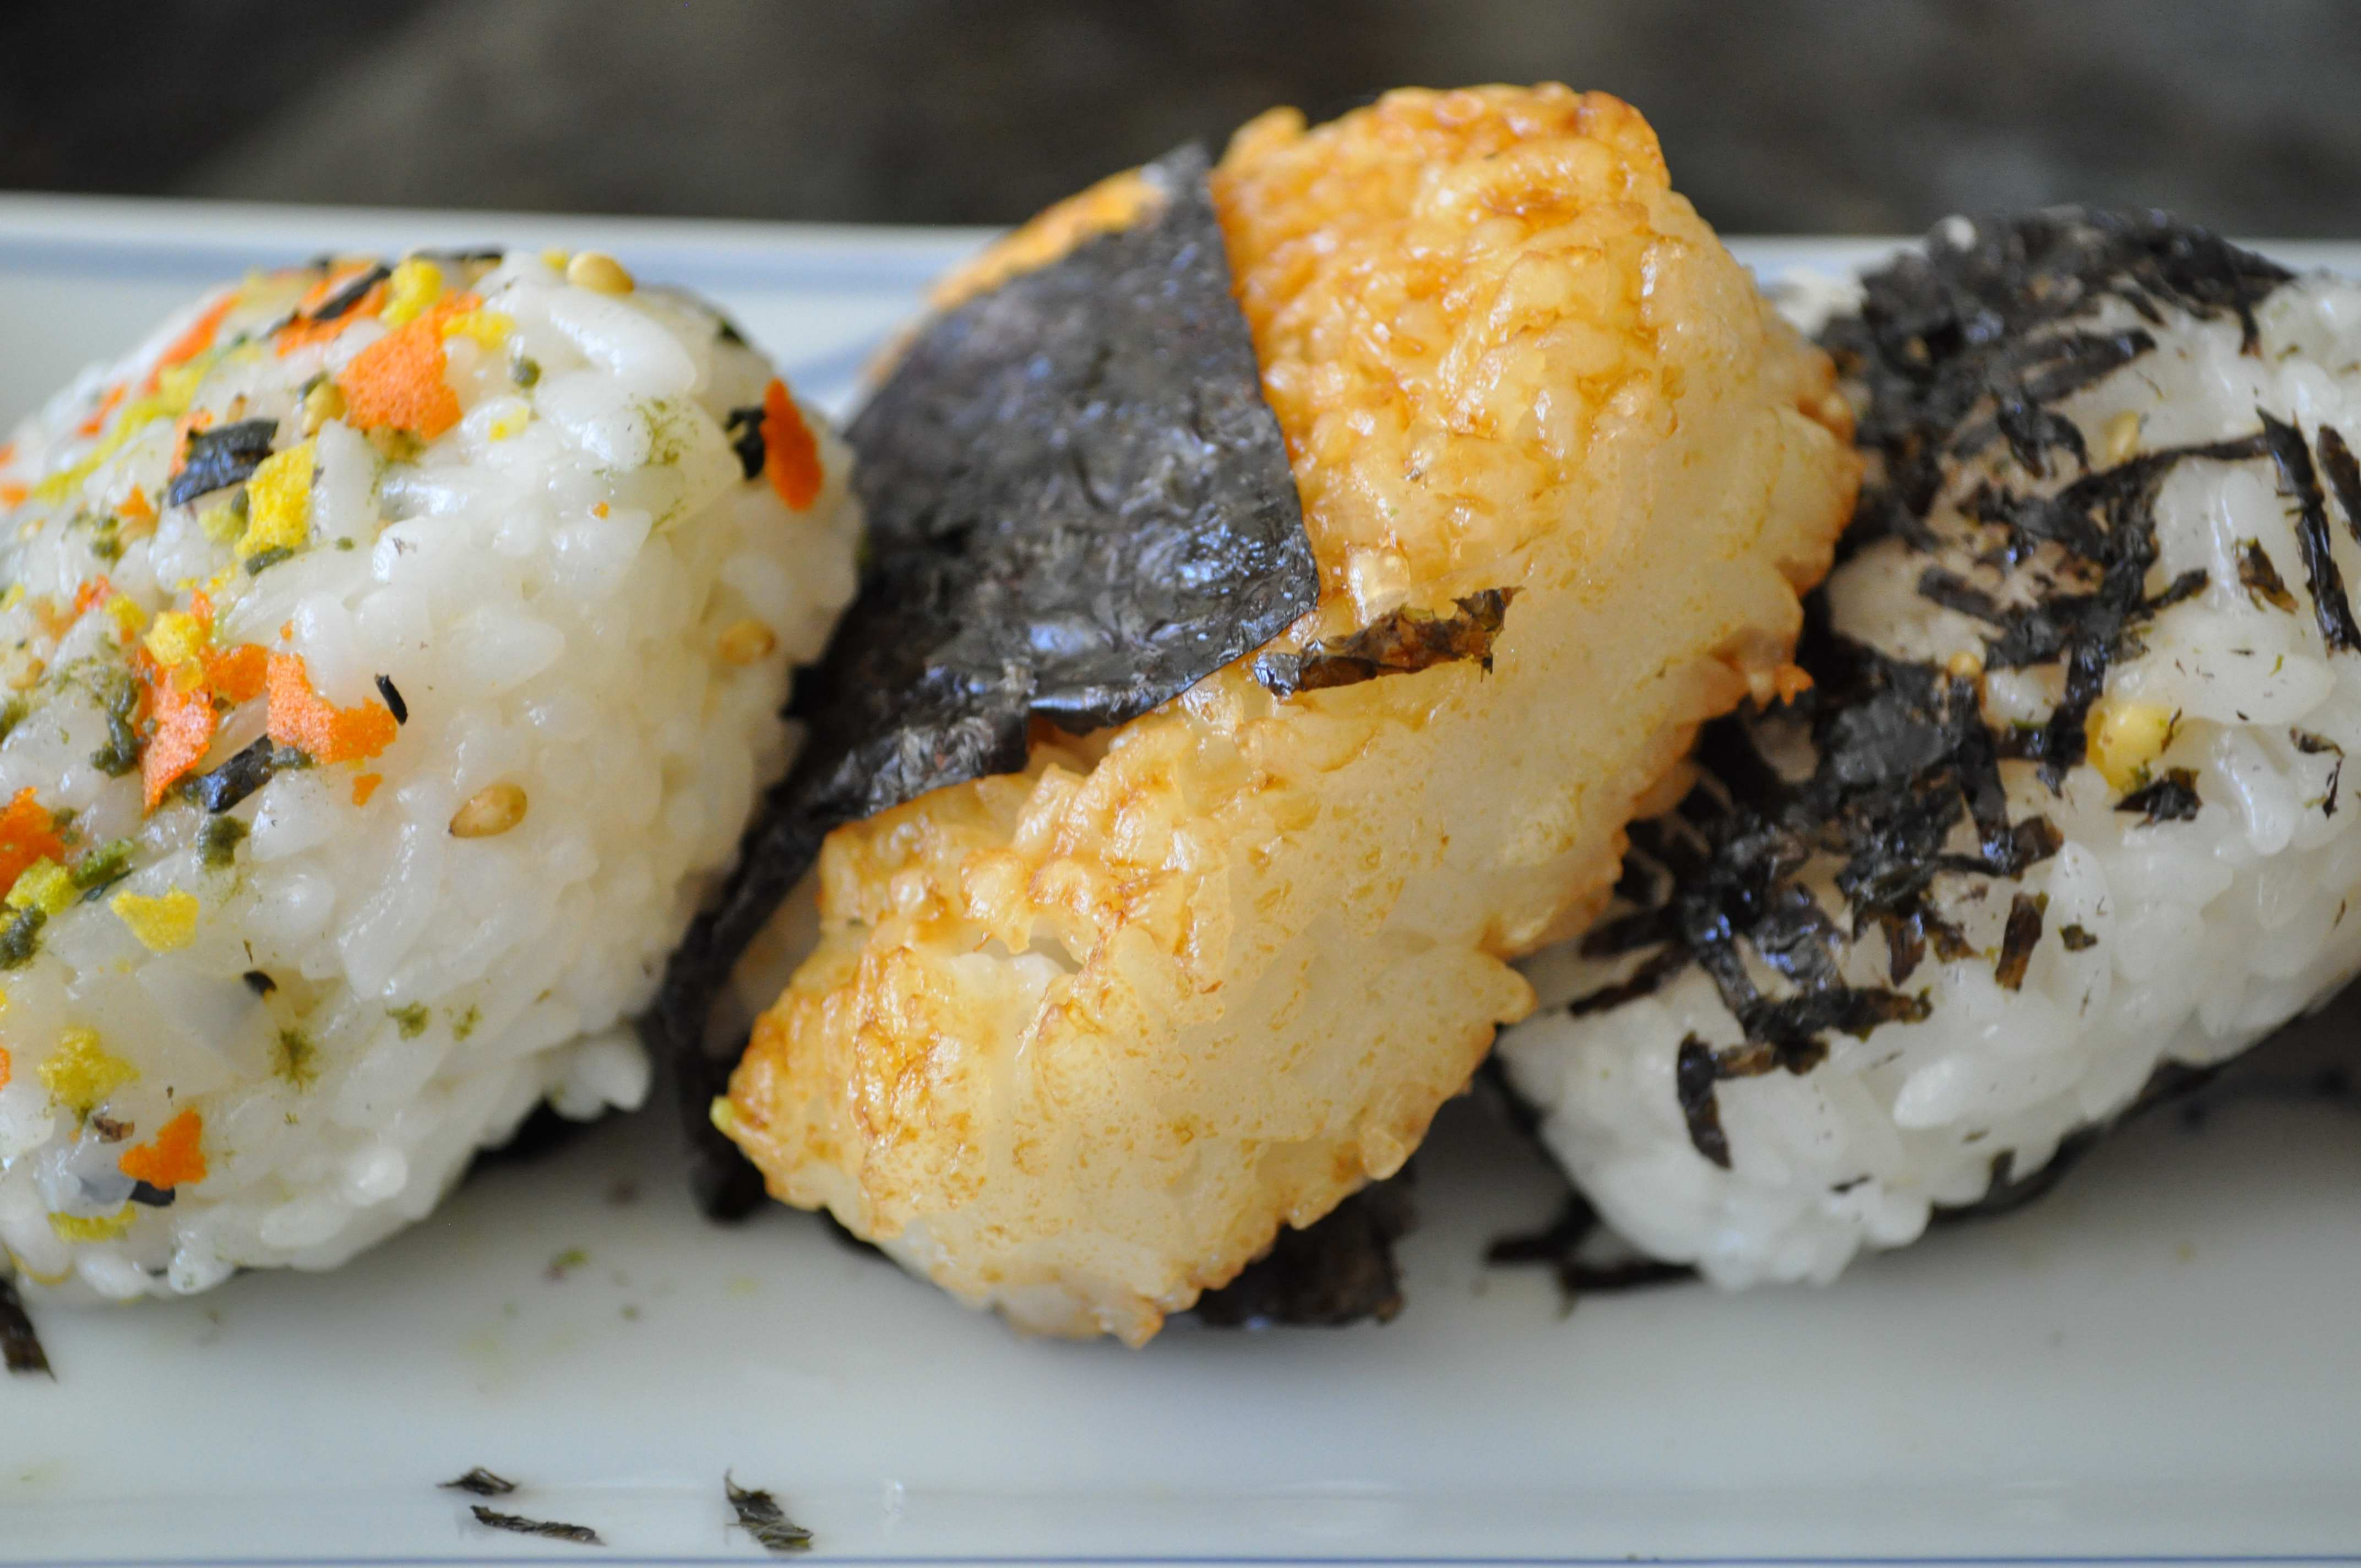 Almost instant Riceball(주먹밥 Joomukbap)